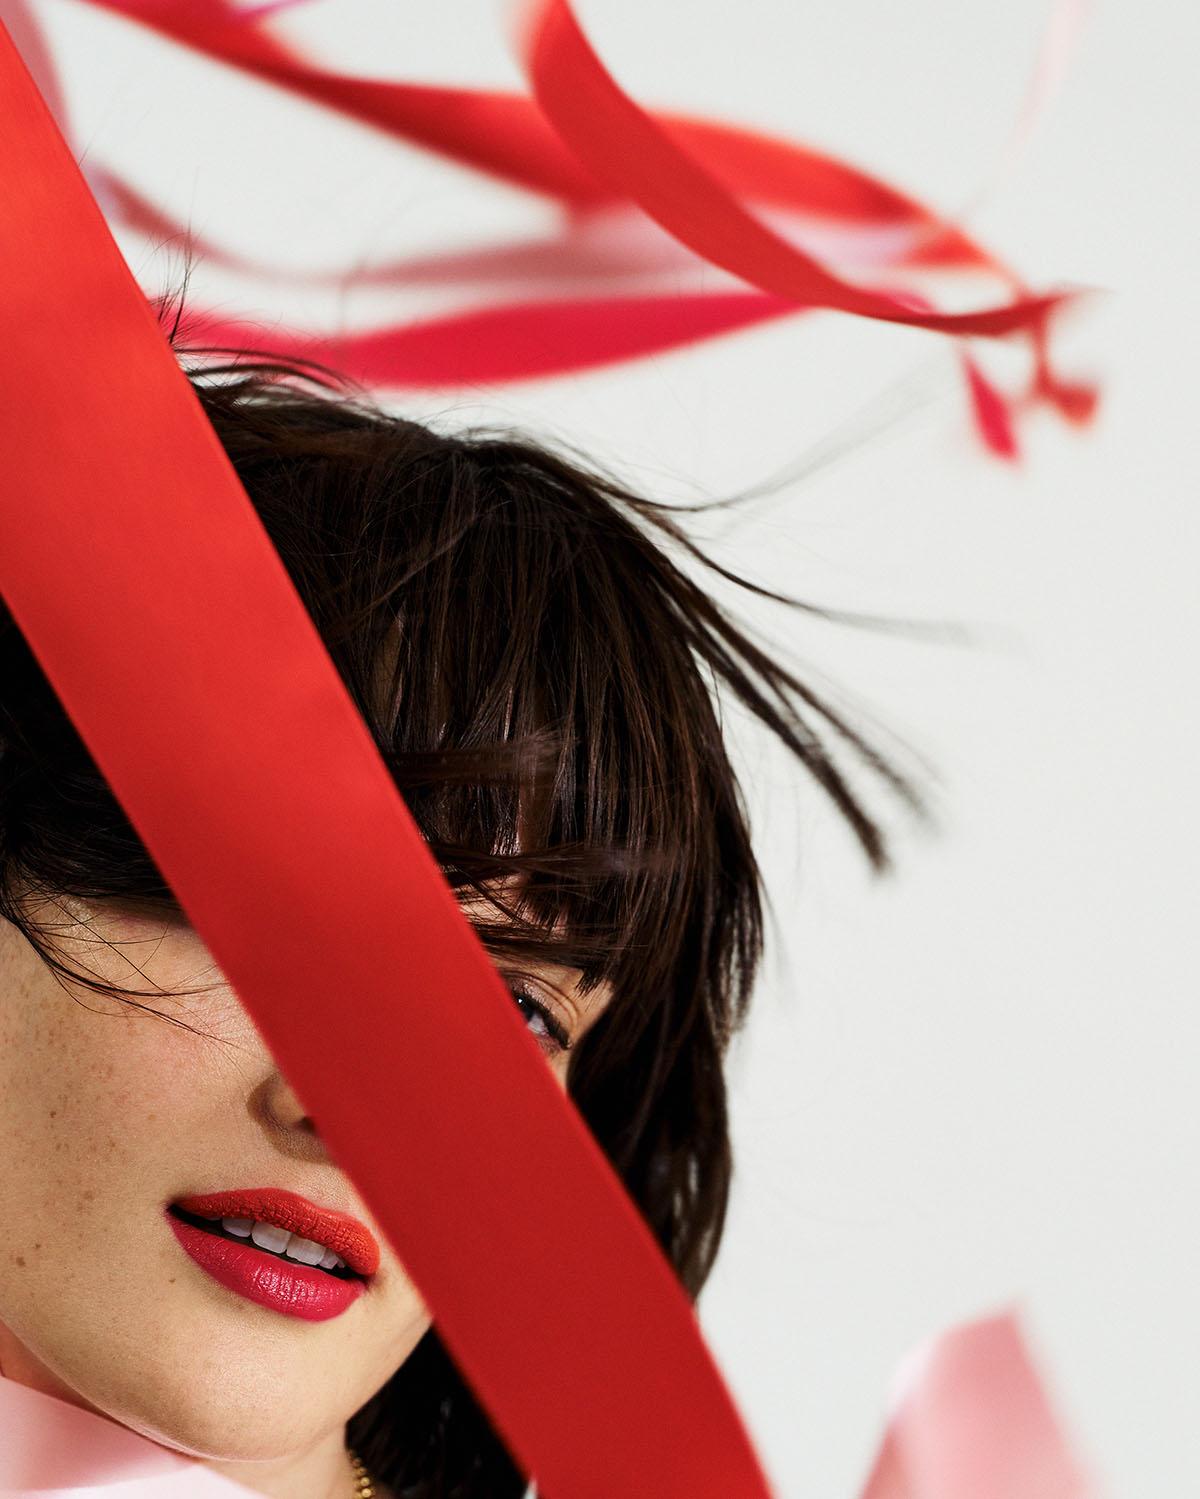 Sam Rollinson covers Elle Russia February 2021 by Turkina Faso